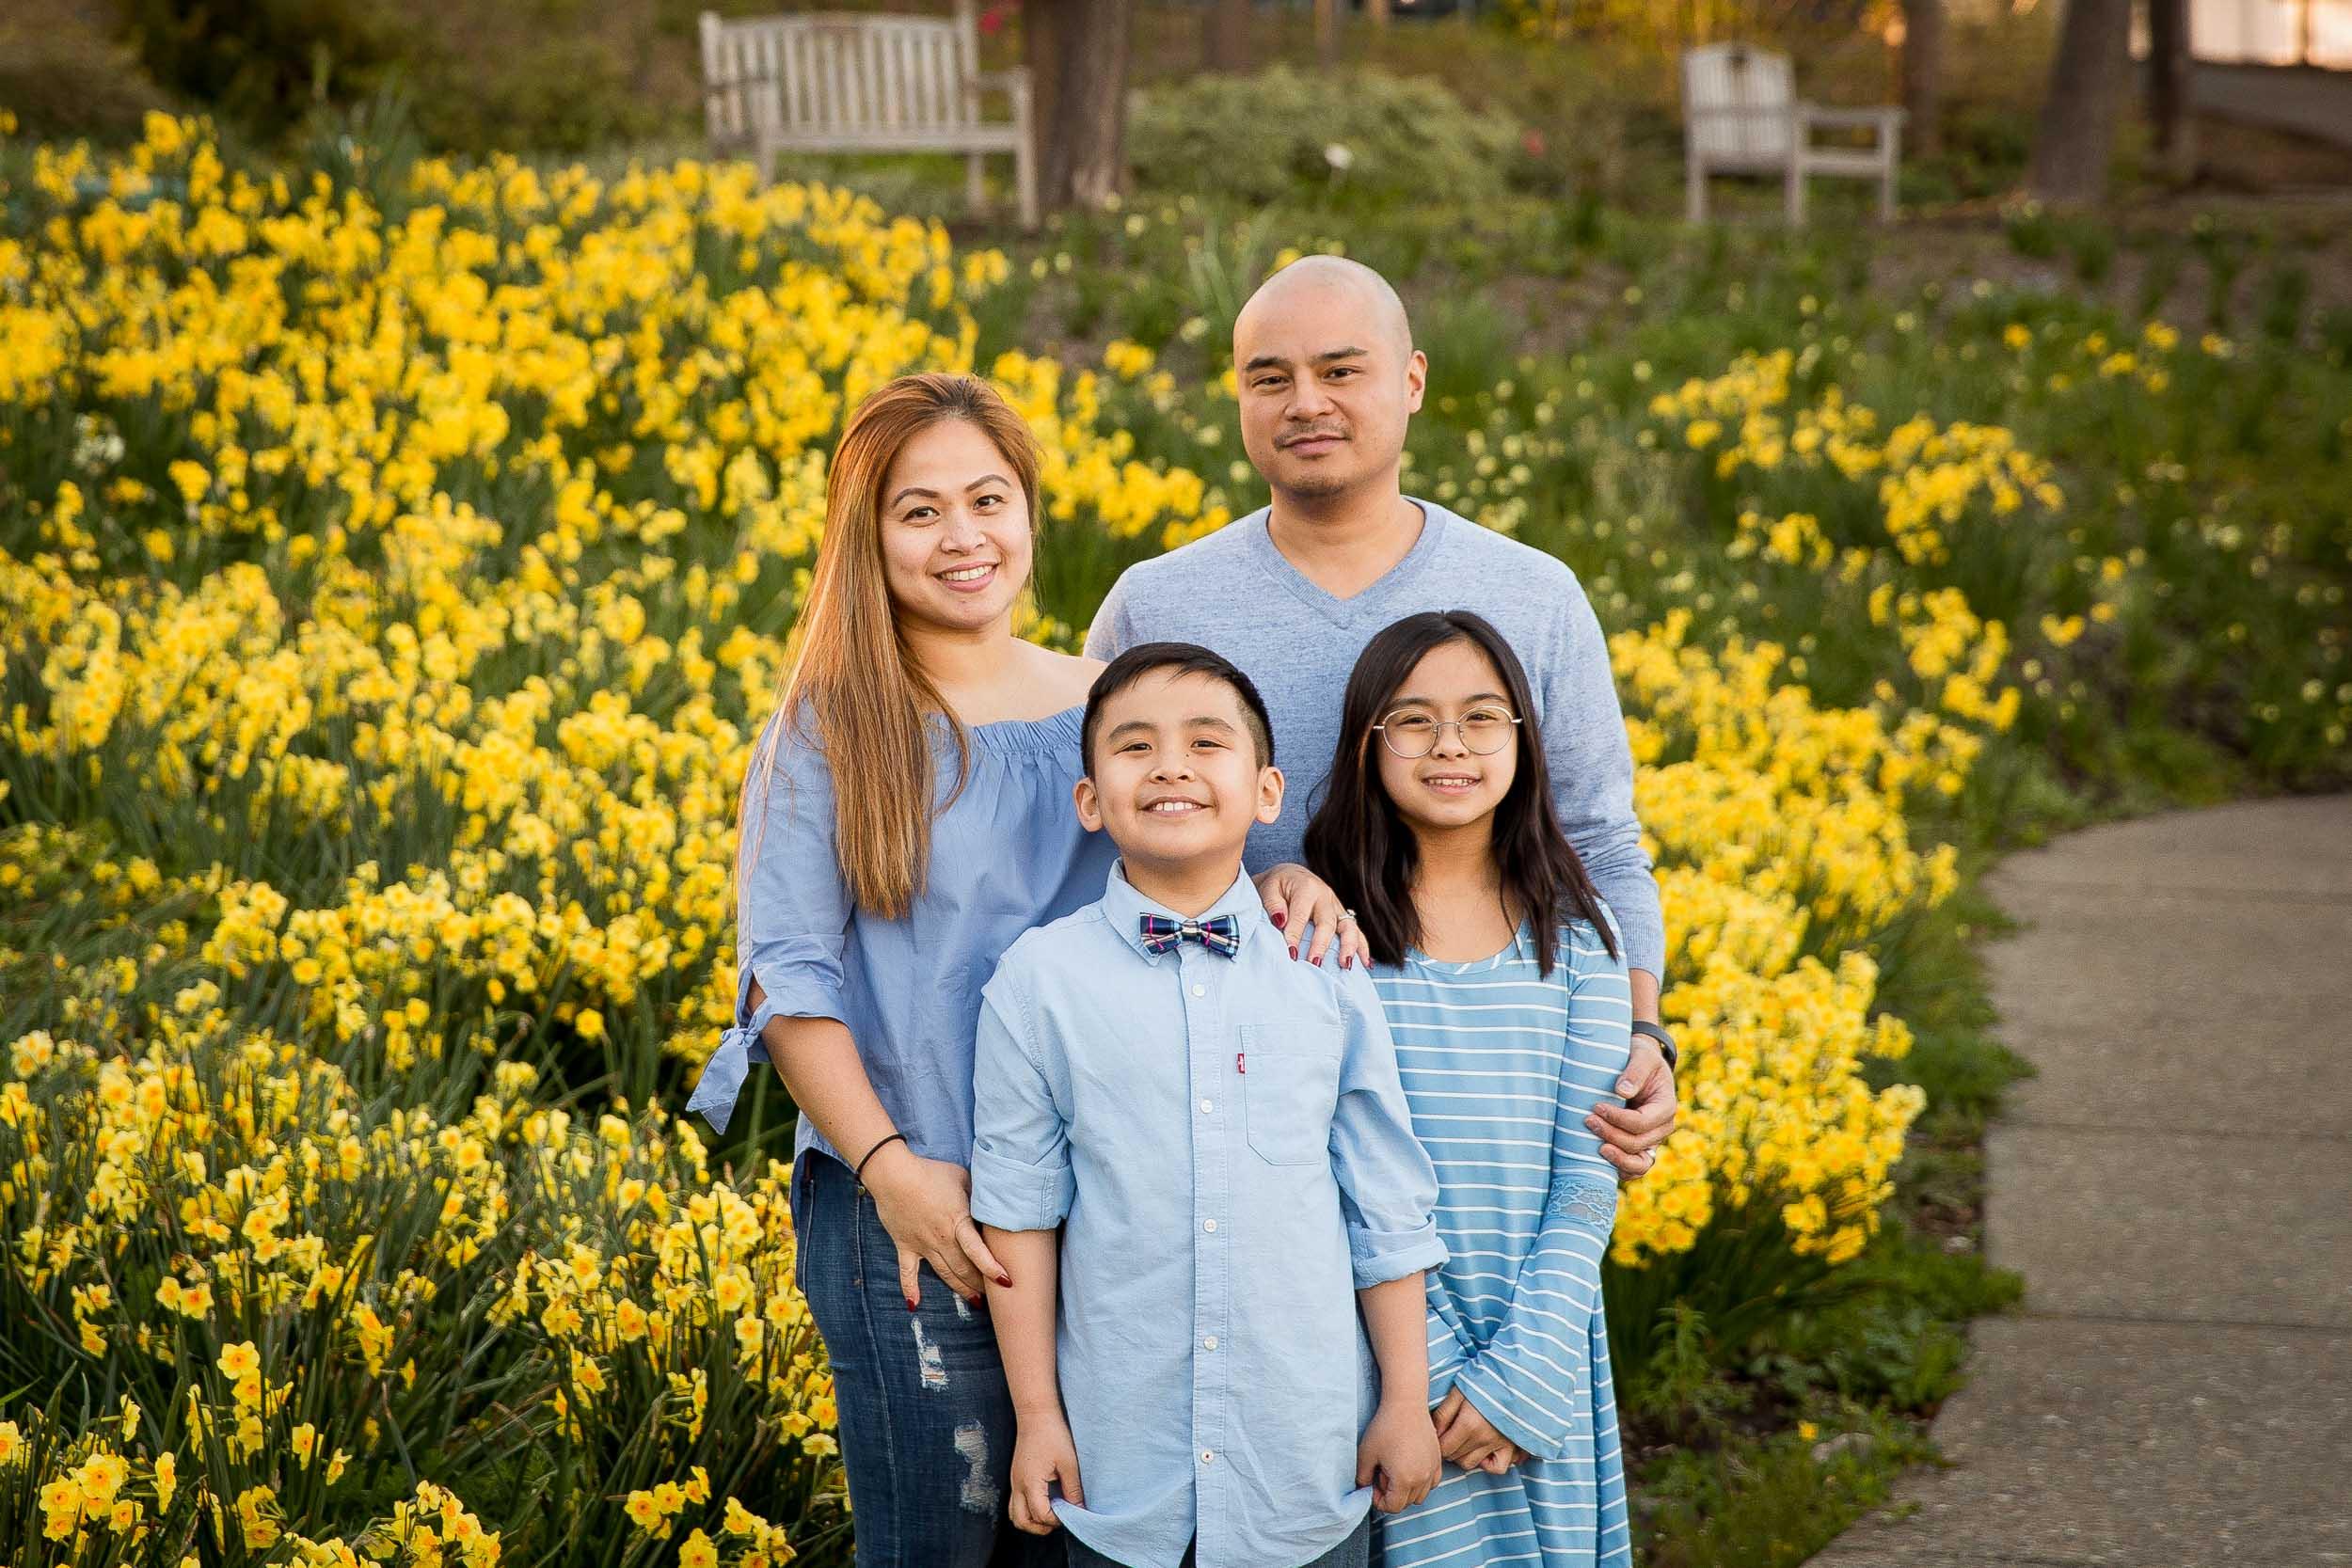 Heather-Farm-Walnut-Creek-family-photos-10.jpg